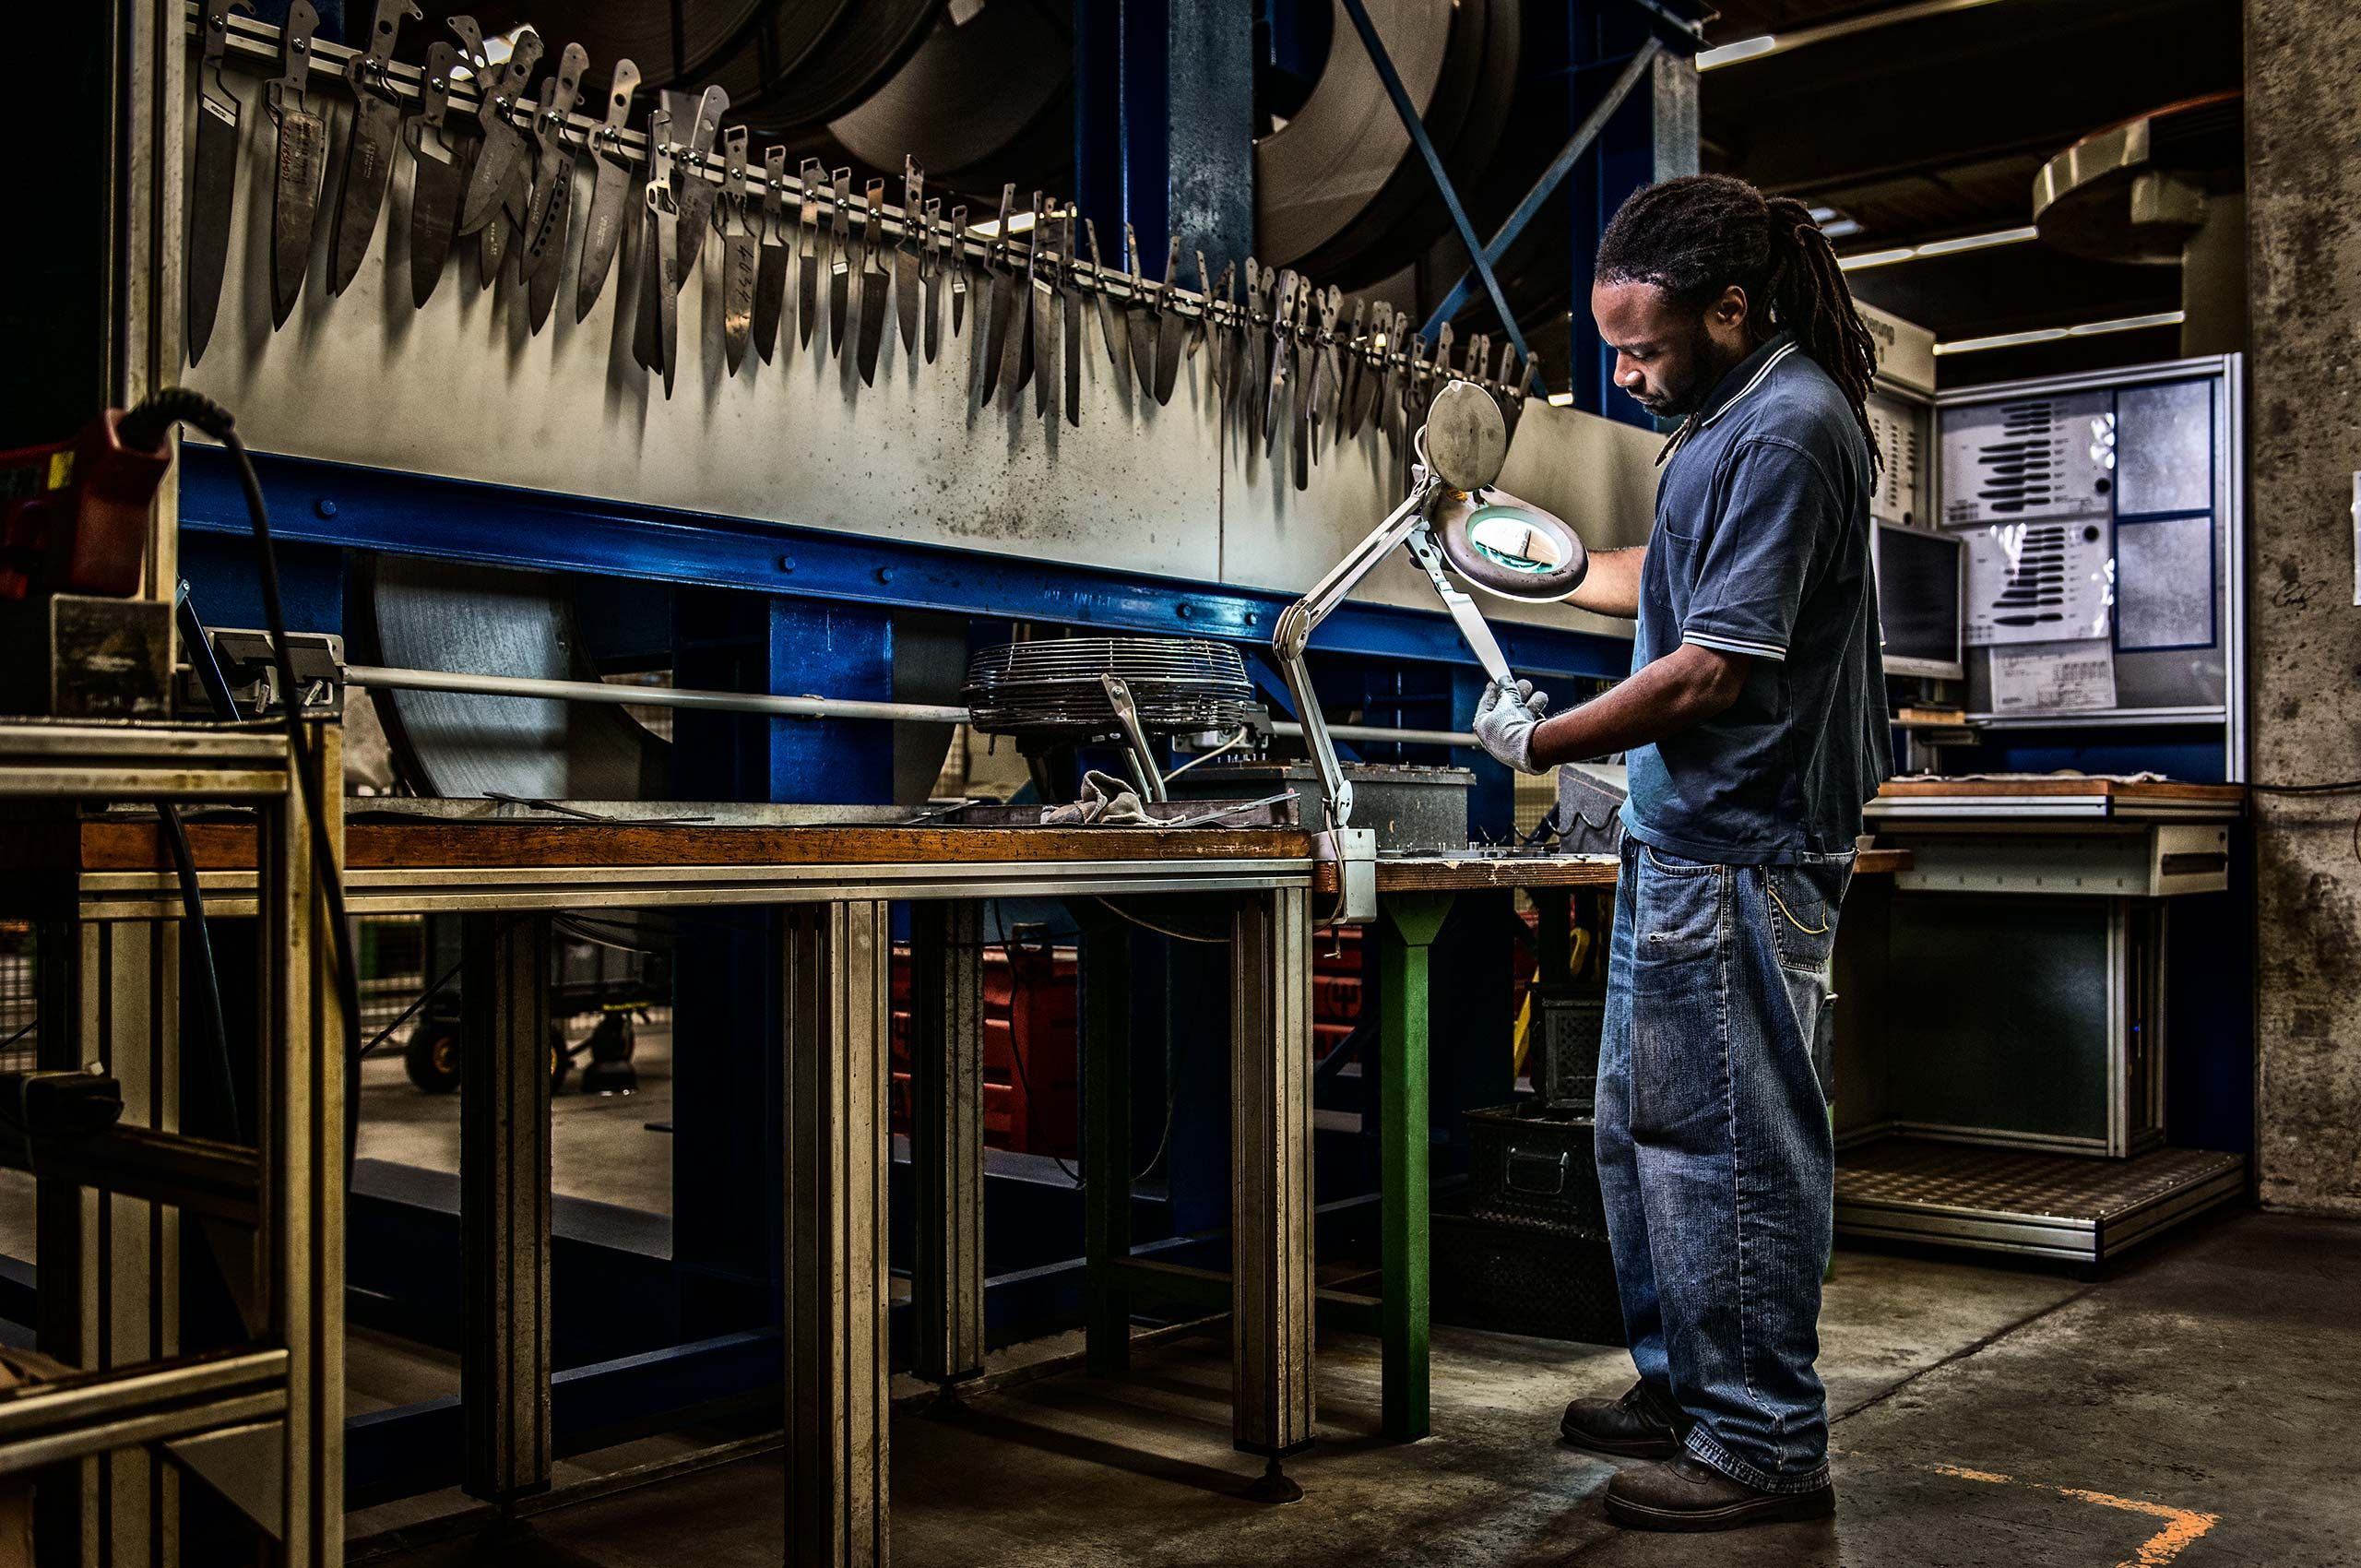 quality-control-wusthof-factory-HenrikOlundPhotography.jpg